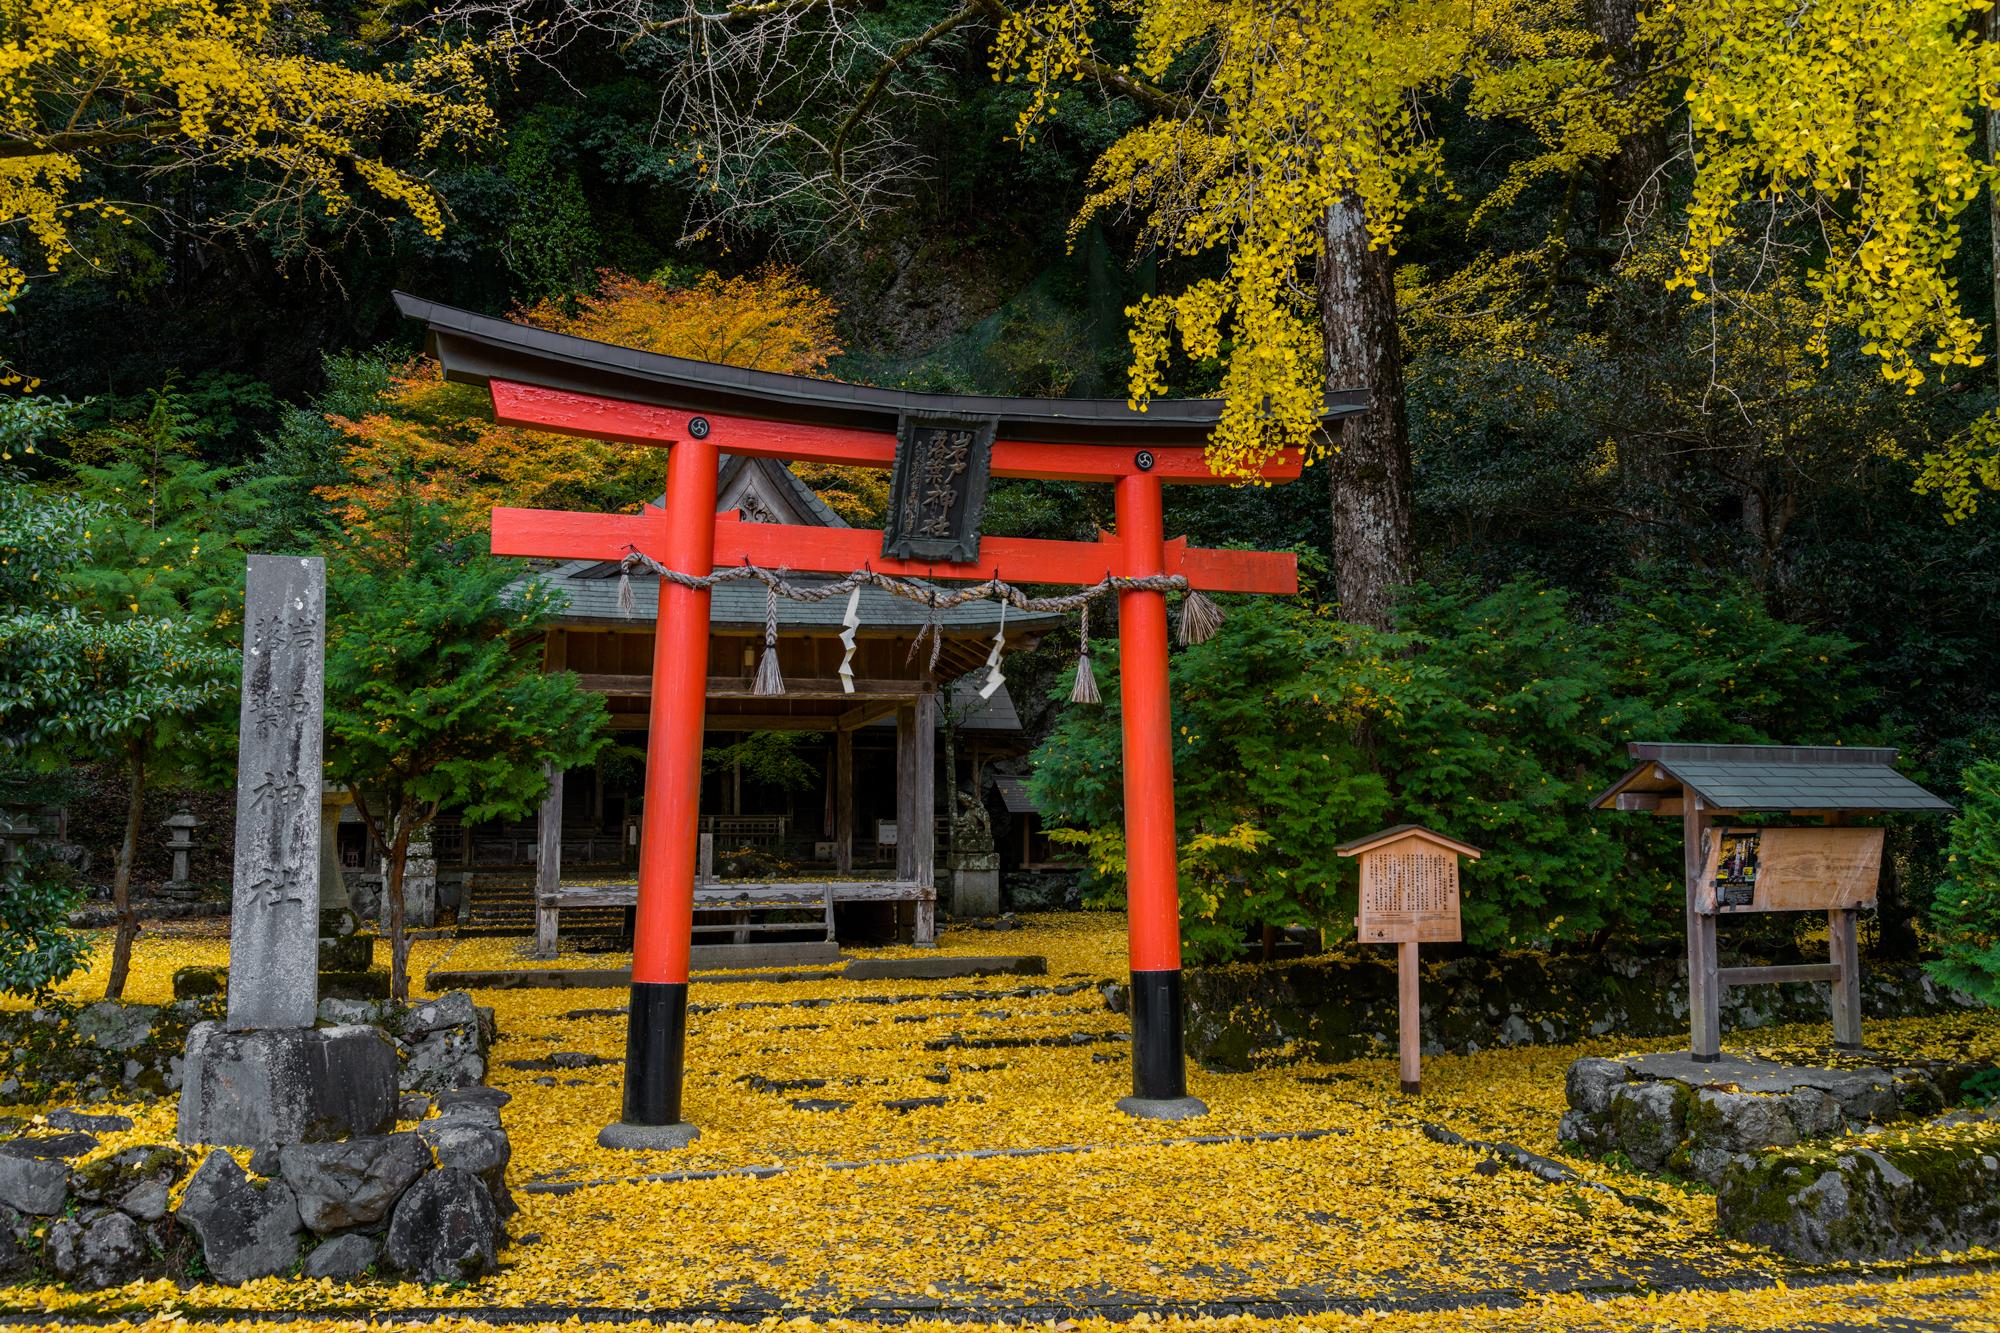 NIKON-CORPORATION_NIKON-D850_3243410482-3243520773_21951 京都  岩戸落葉神社  Kyoto Iwato Ochiba Jinja( 2019年 京都の秋、境内が黄色の絨毯に染まるイチョウのおすすめの写真スポット・アクセス情報や交通手段など!)